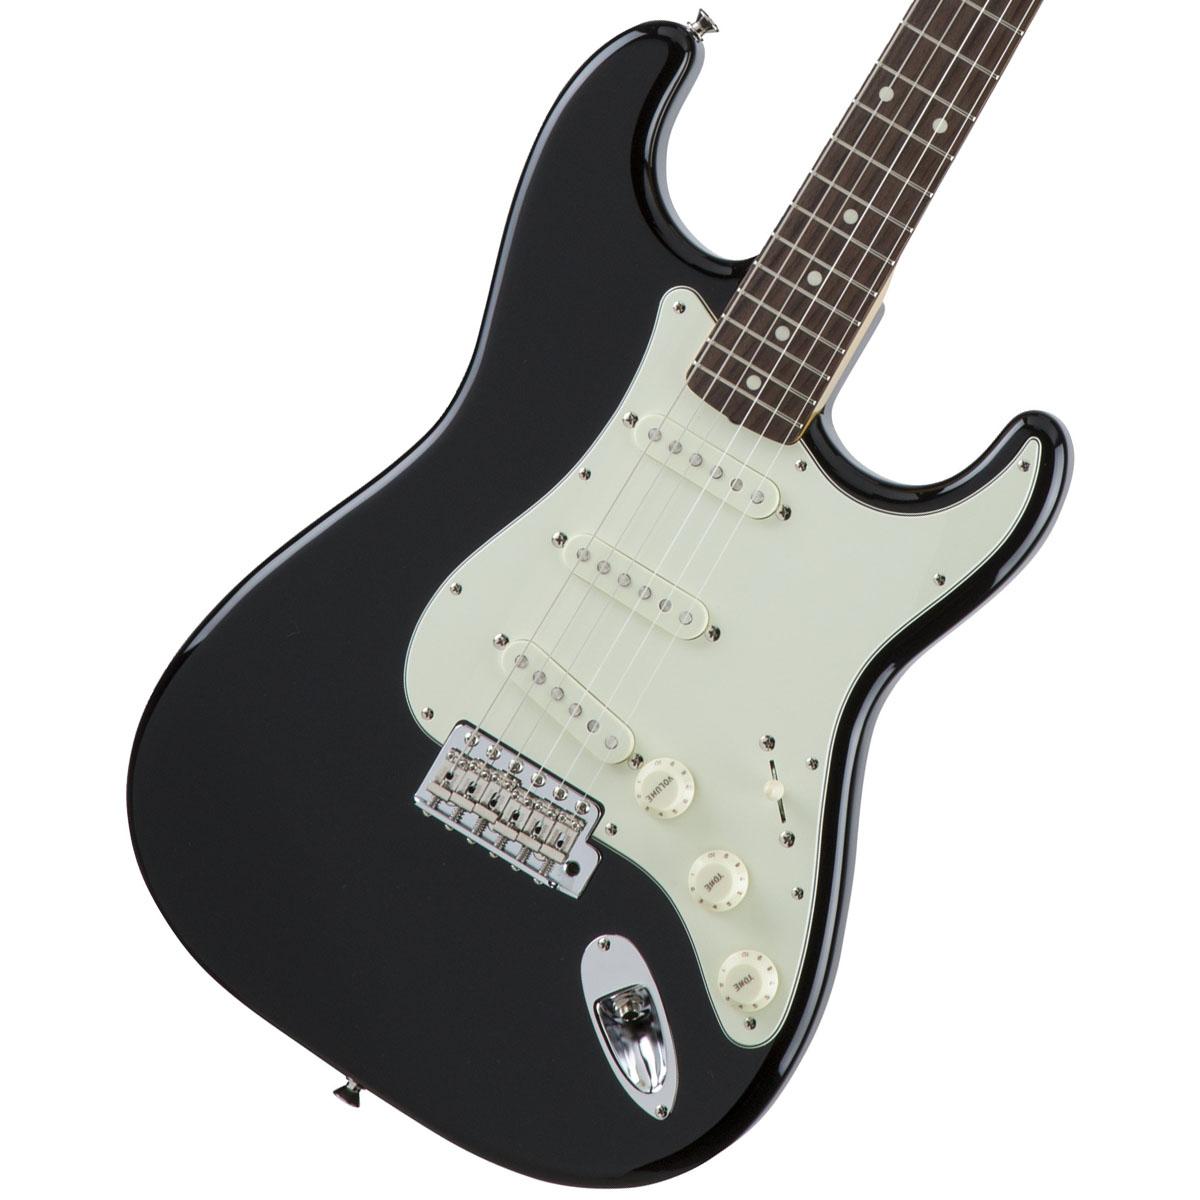 Fender / Made in Japan Traditional 60s Stratocaster Rosewood Fingerboard Black《カスタムショップのお手入れ用品を進呈/+671038200》